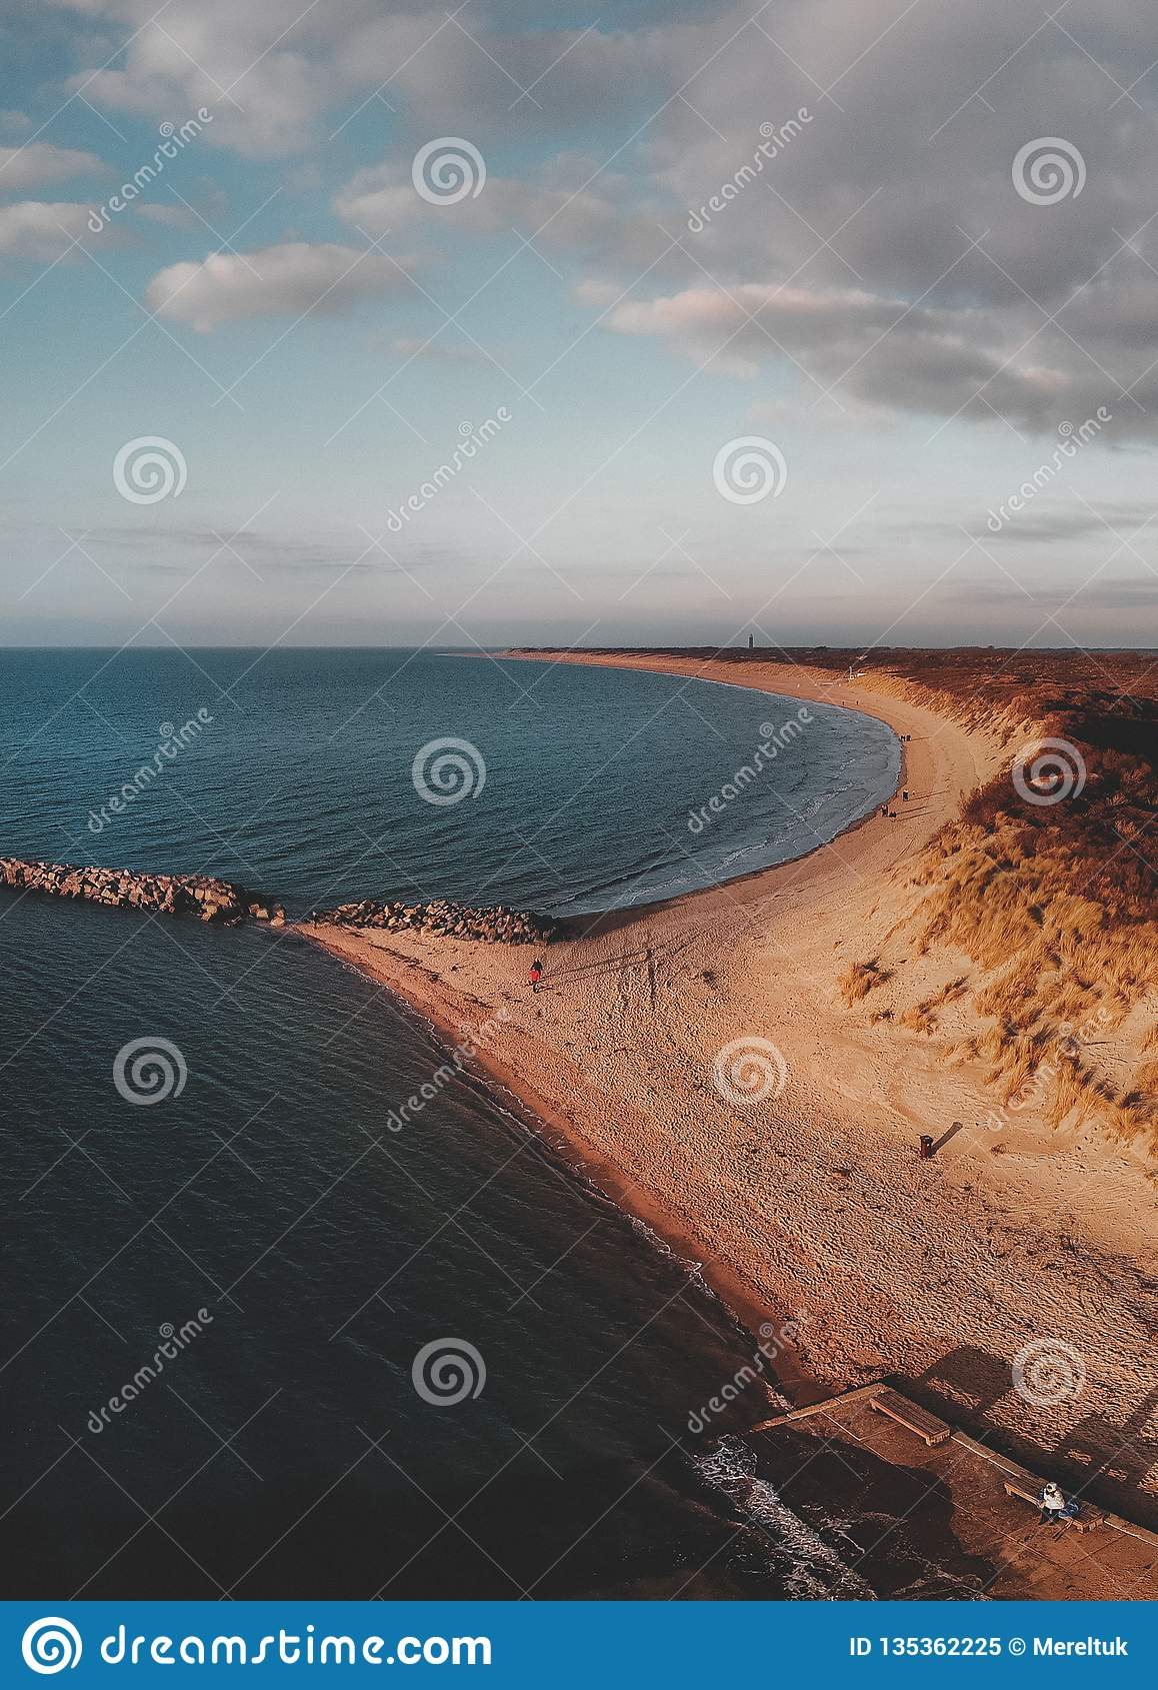 Aerial shot of Goeree-Overflakkee, The Netherlands, Brouwersdam 2019